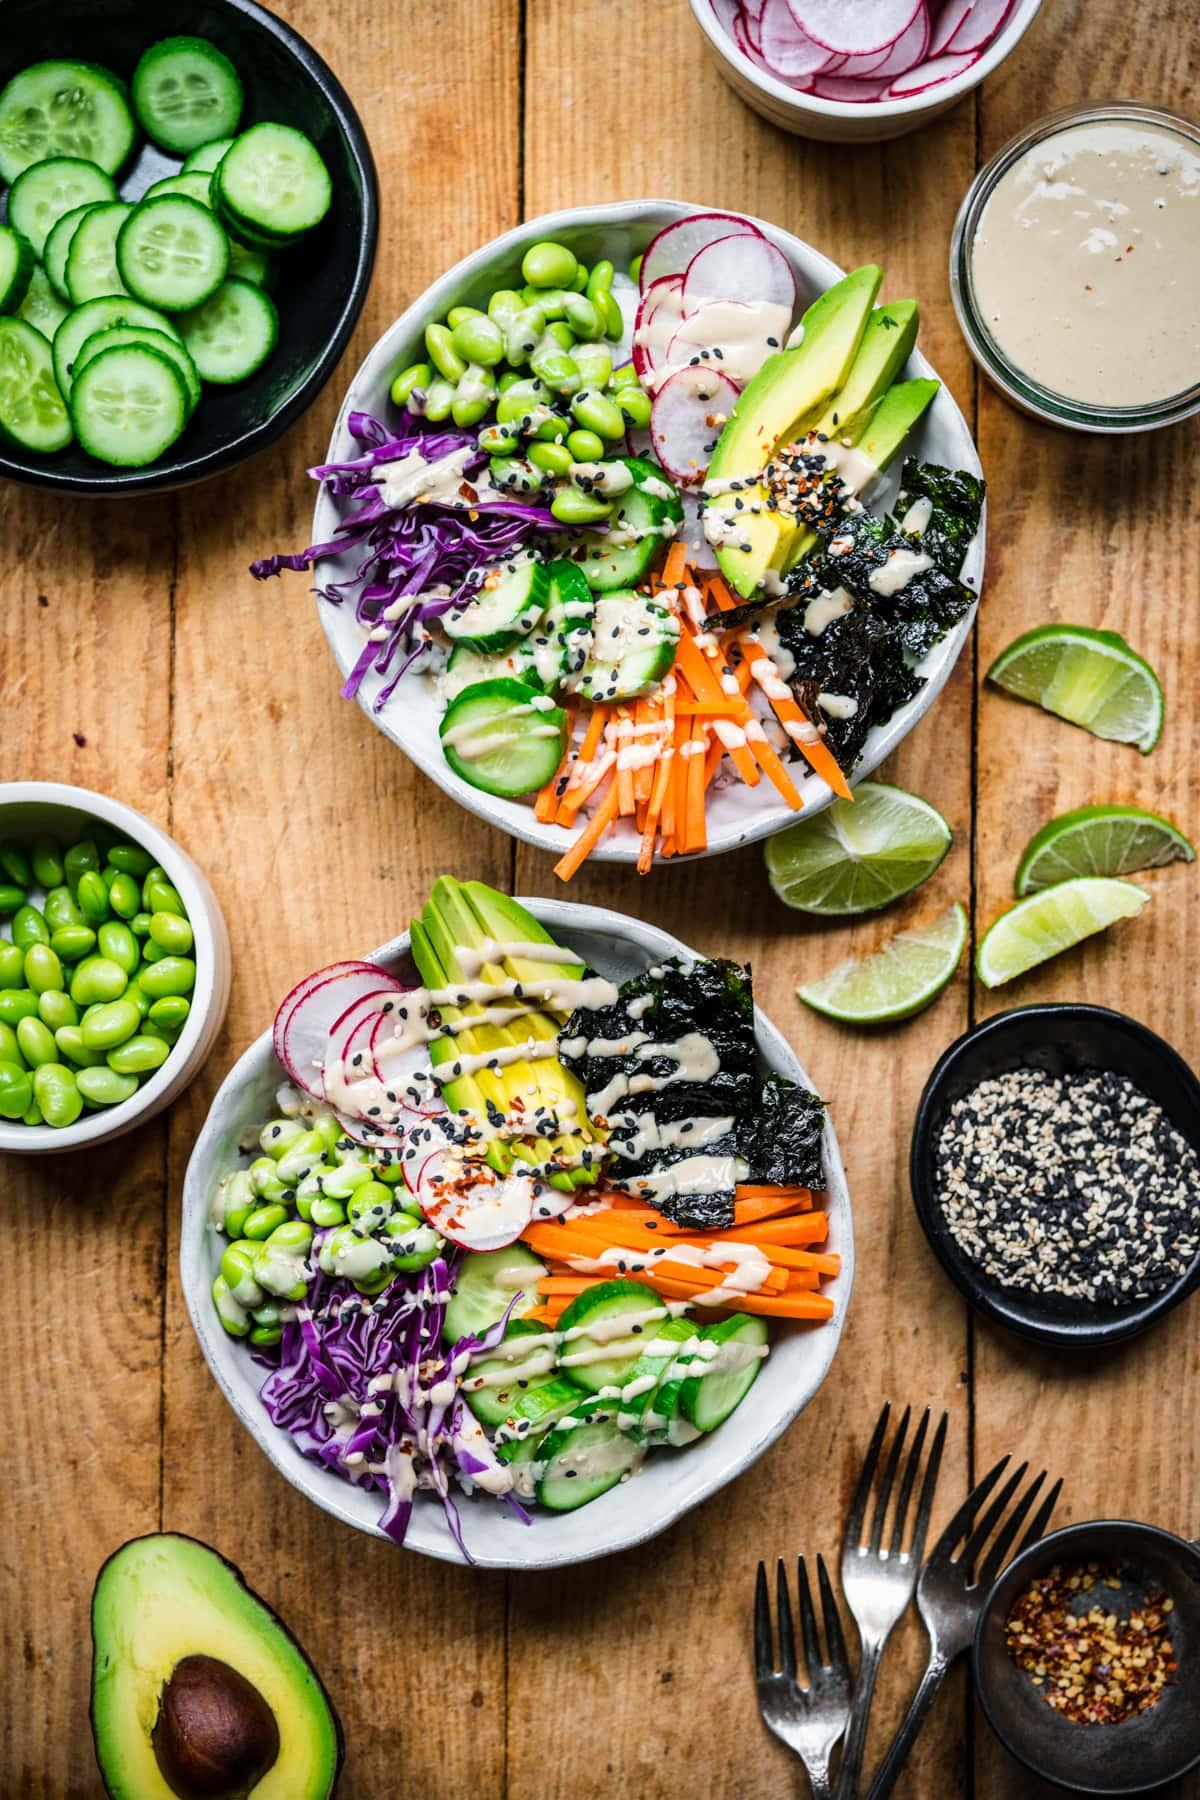 overhead view of vegan sushi bowls with avocado, radishes, cucumber, edamame and miso tahini dressing.